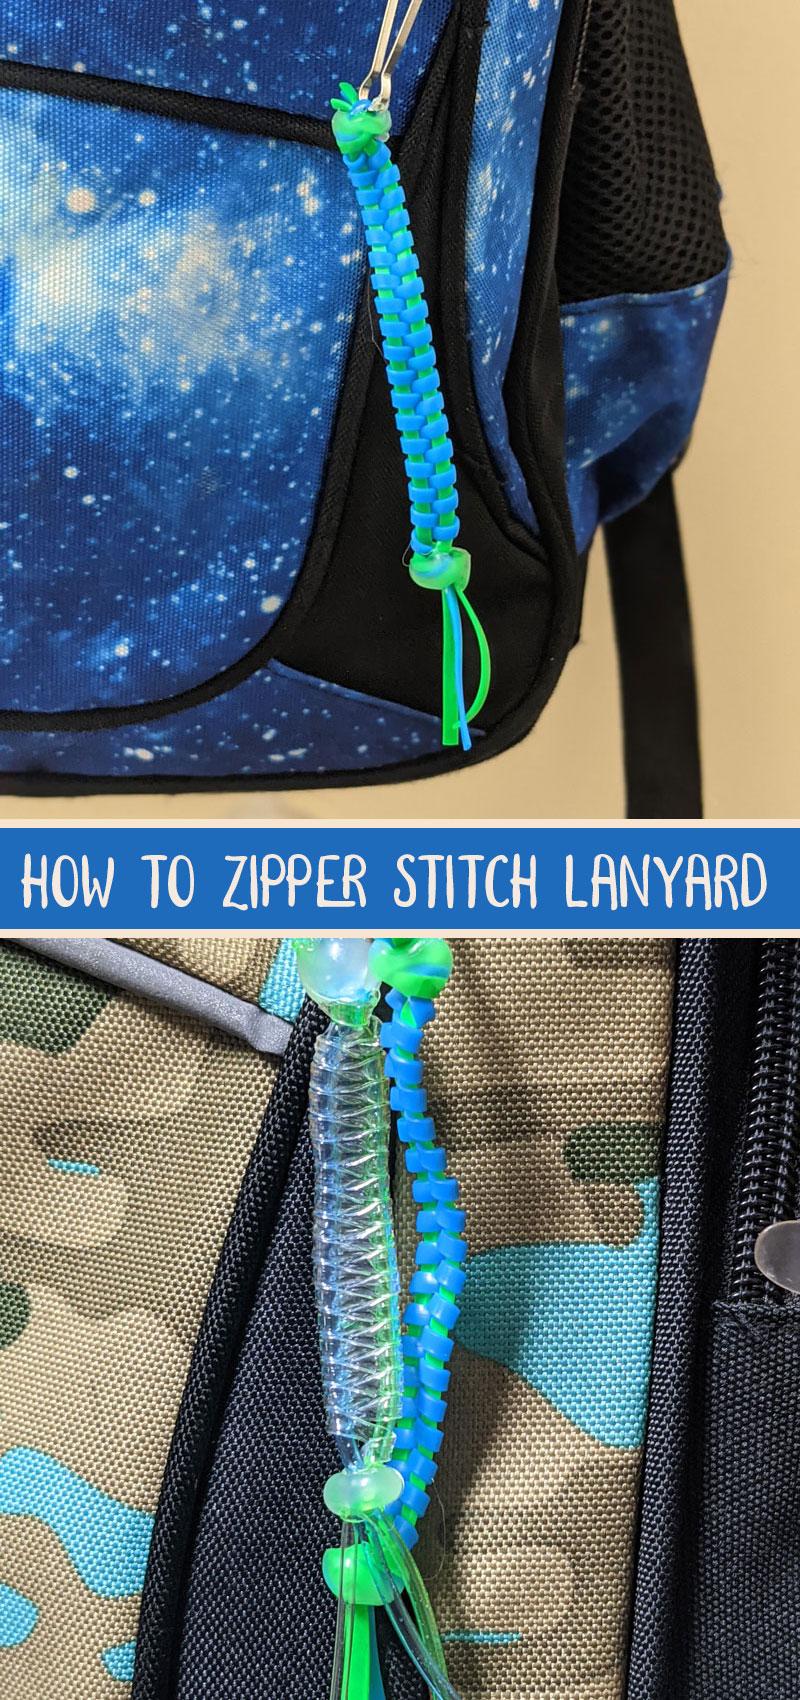 zipper stitch lanyard on backpacks